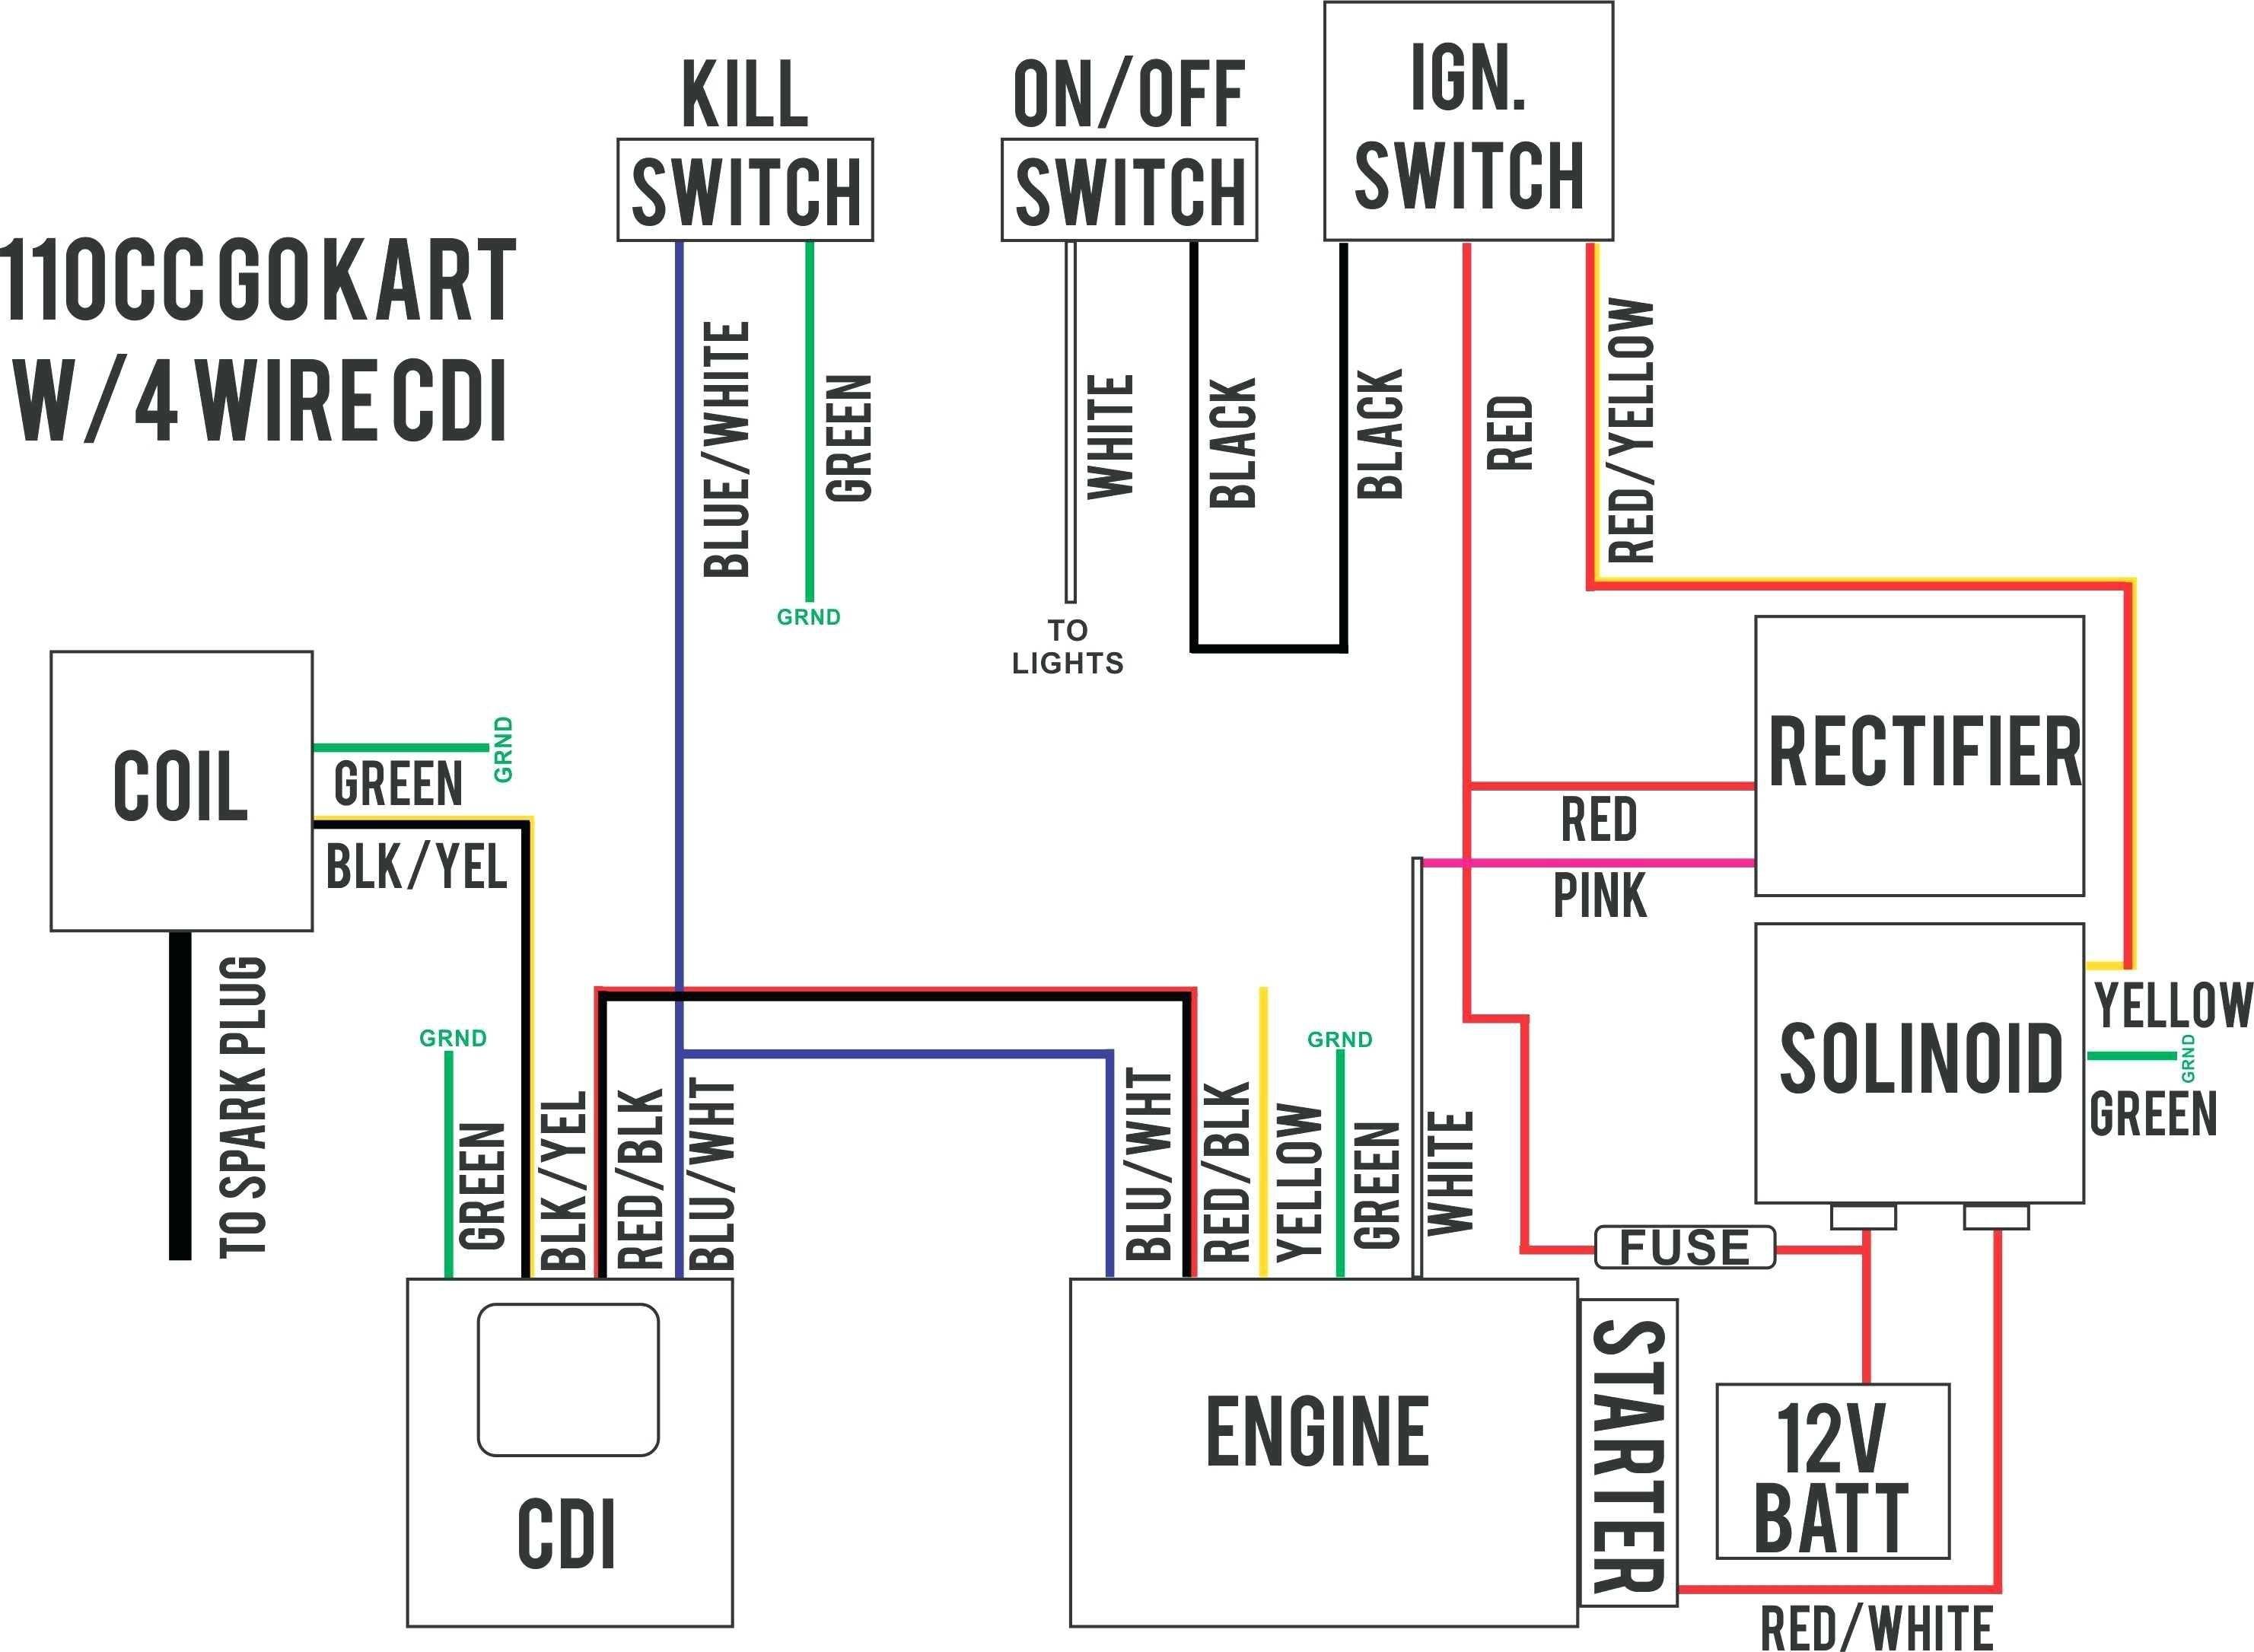 6 Pin Cdi Wiring Diagram Collection Lovely 5 Pin Cdi Box Wiring Diagram 7